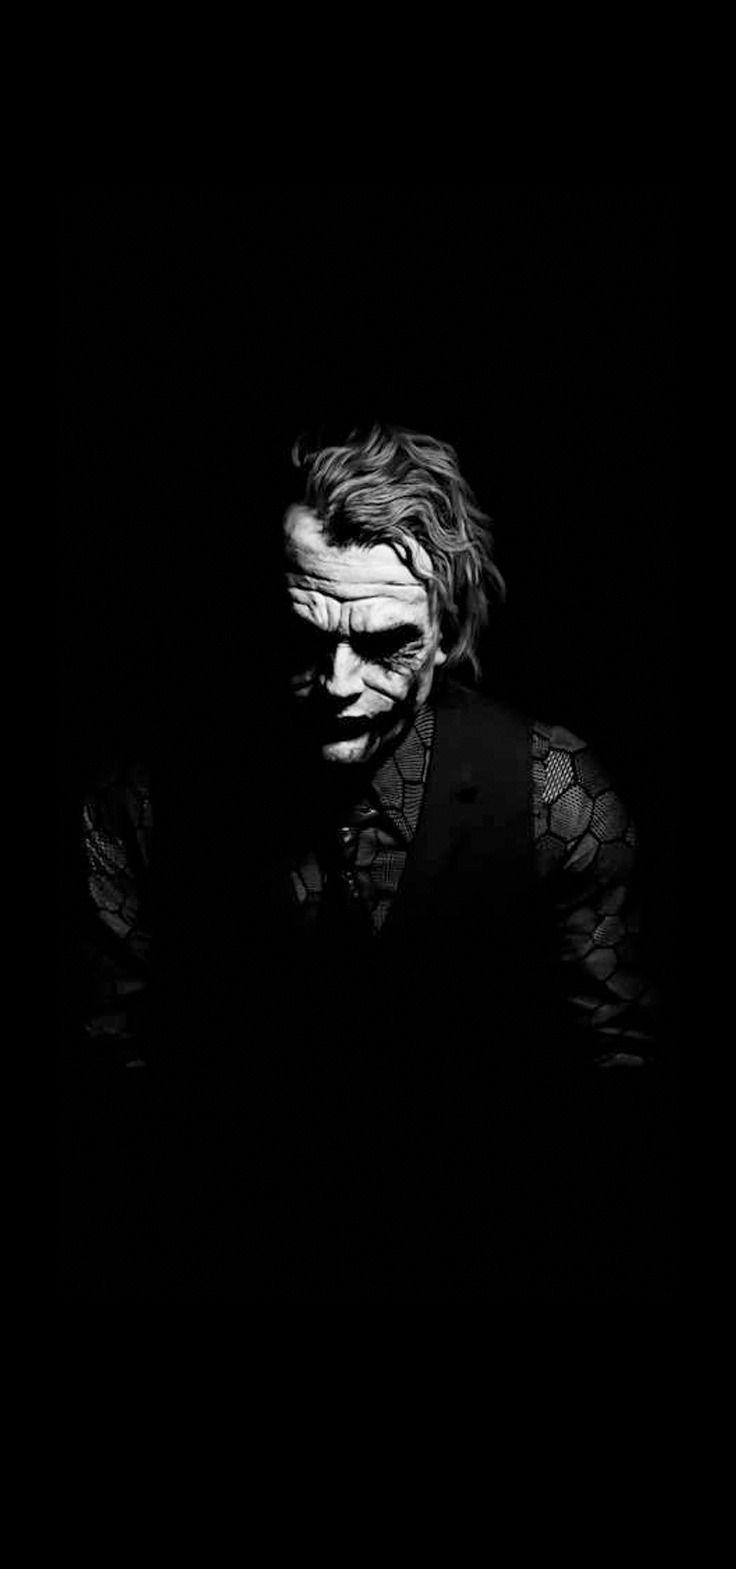 30 Wallpaper 4k Phone Black Wallpaper Joker Pics Most Beautiful Wallpaper